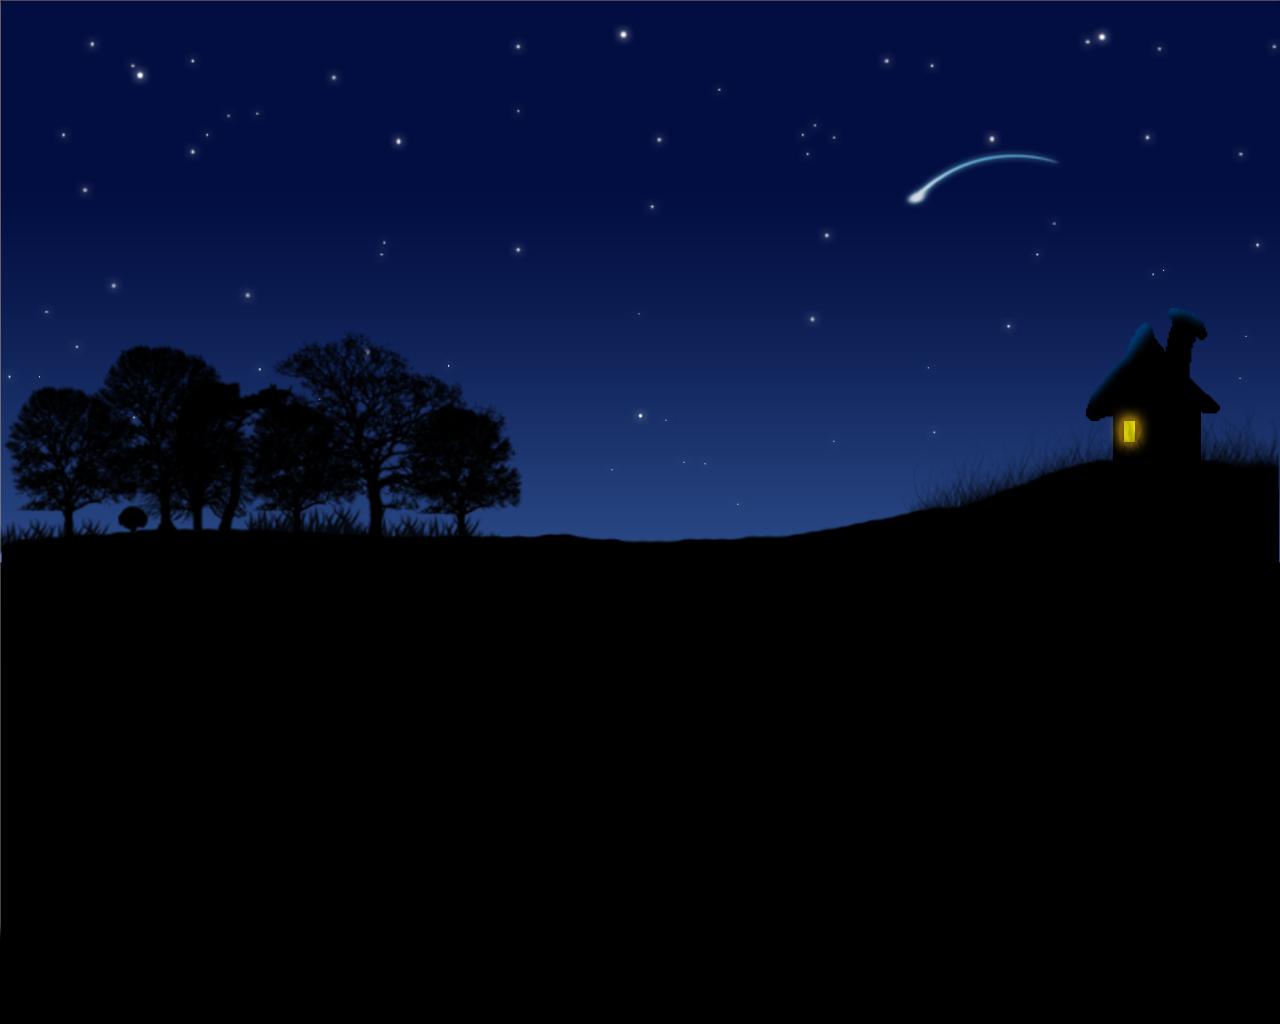 night sky wallpaper by nesh82 customization wallpaper fantasy 2008 1280x1024